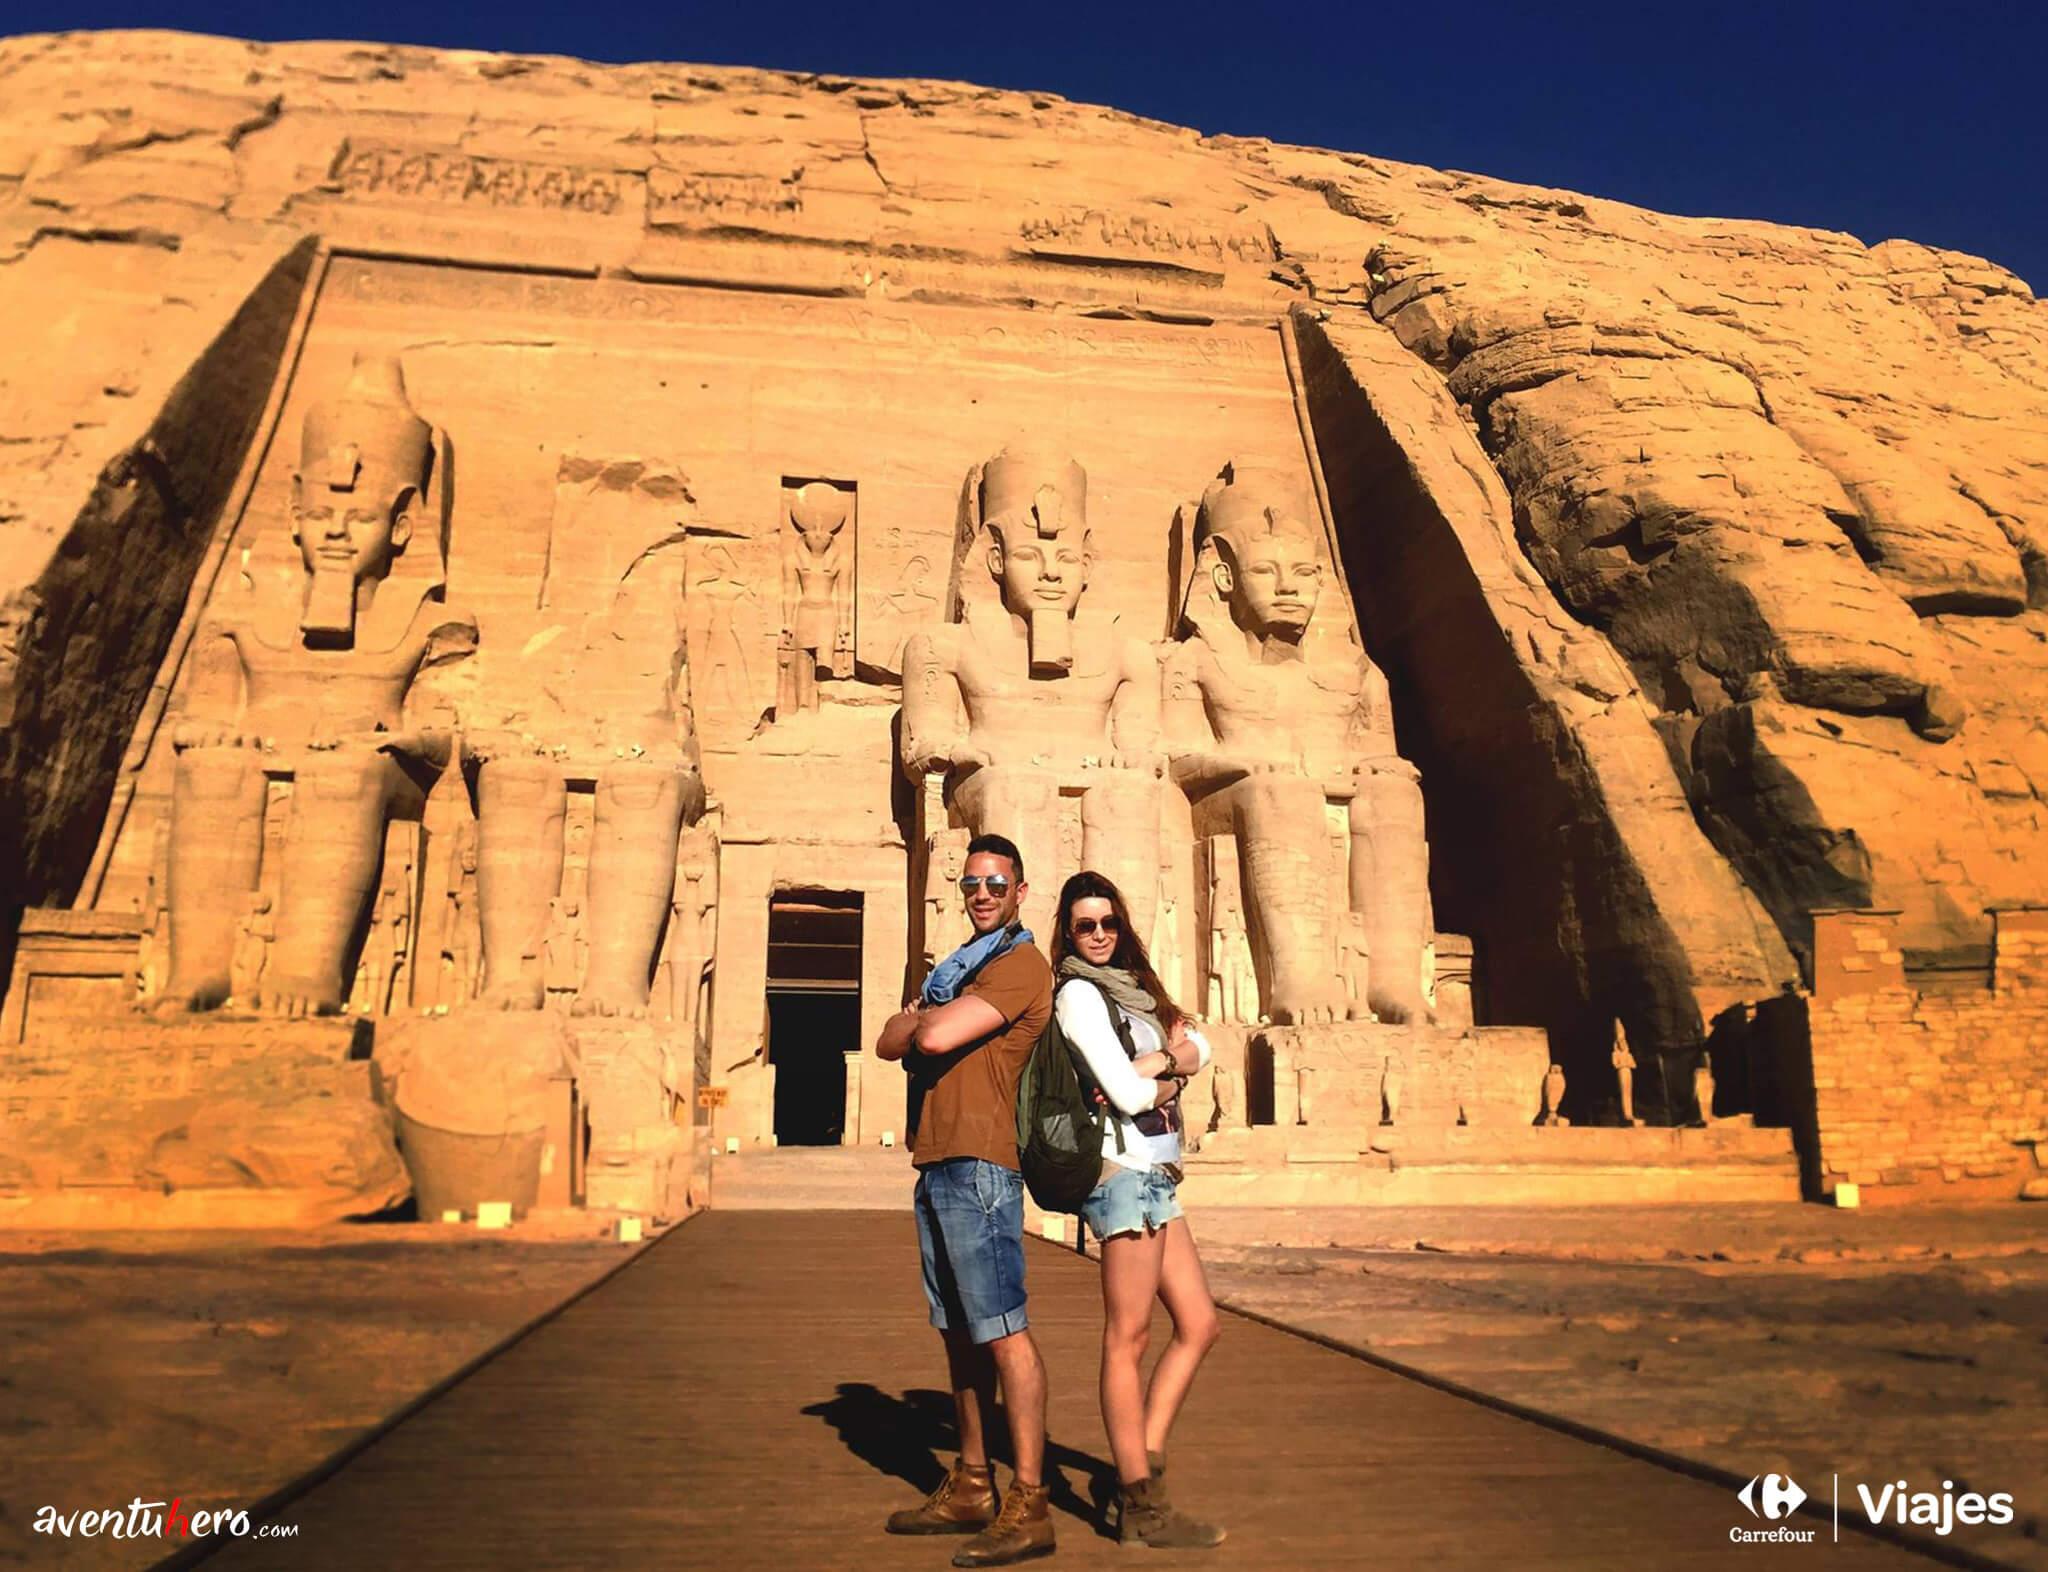 2 Aventuhero A las puertas de Abu Simbel